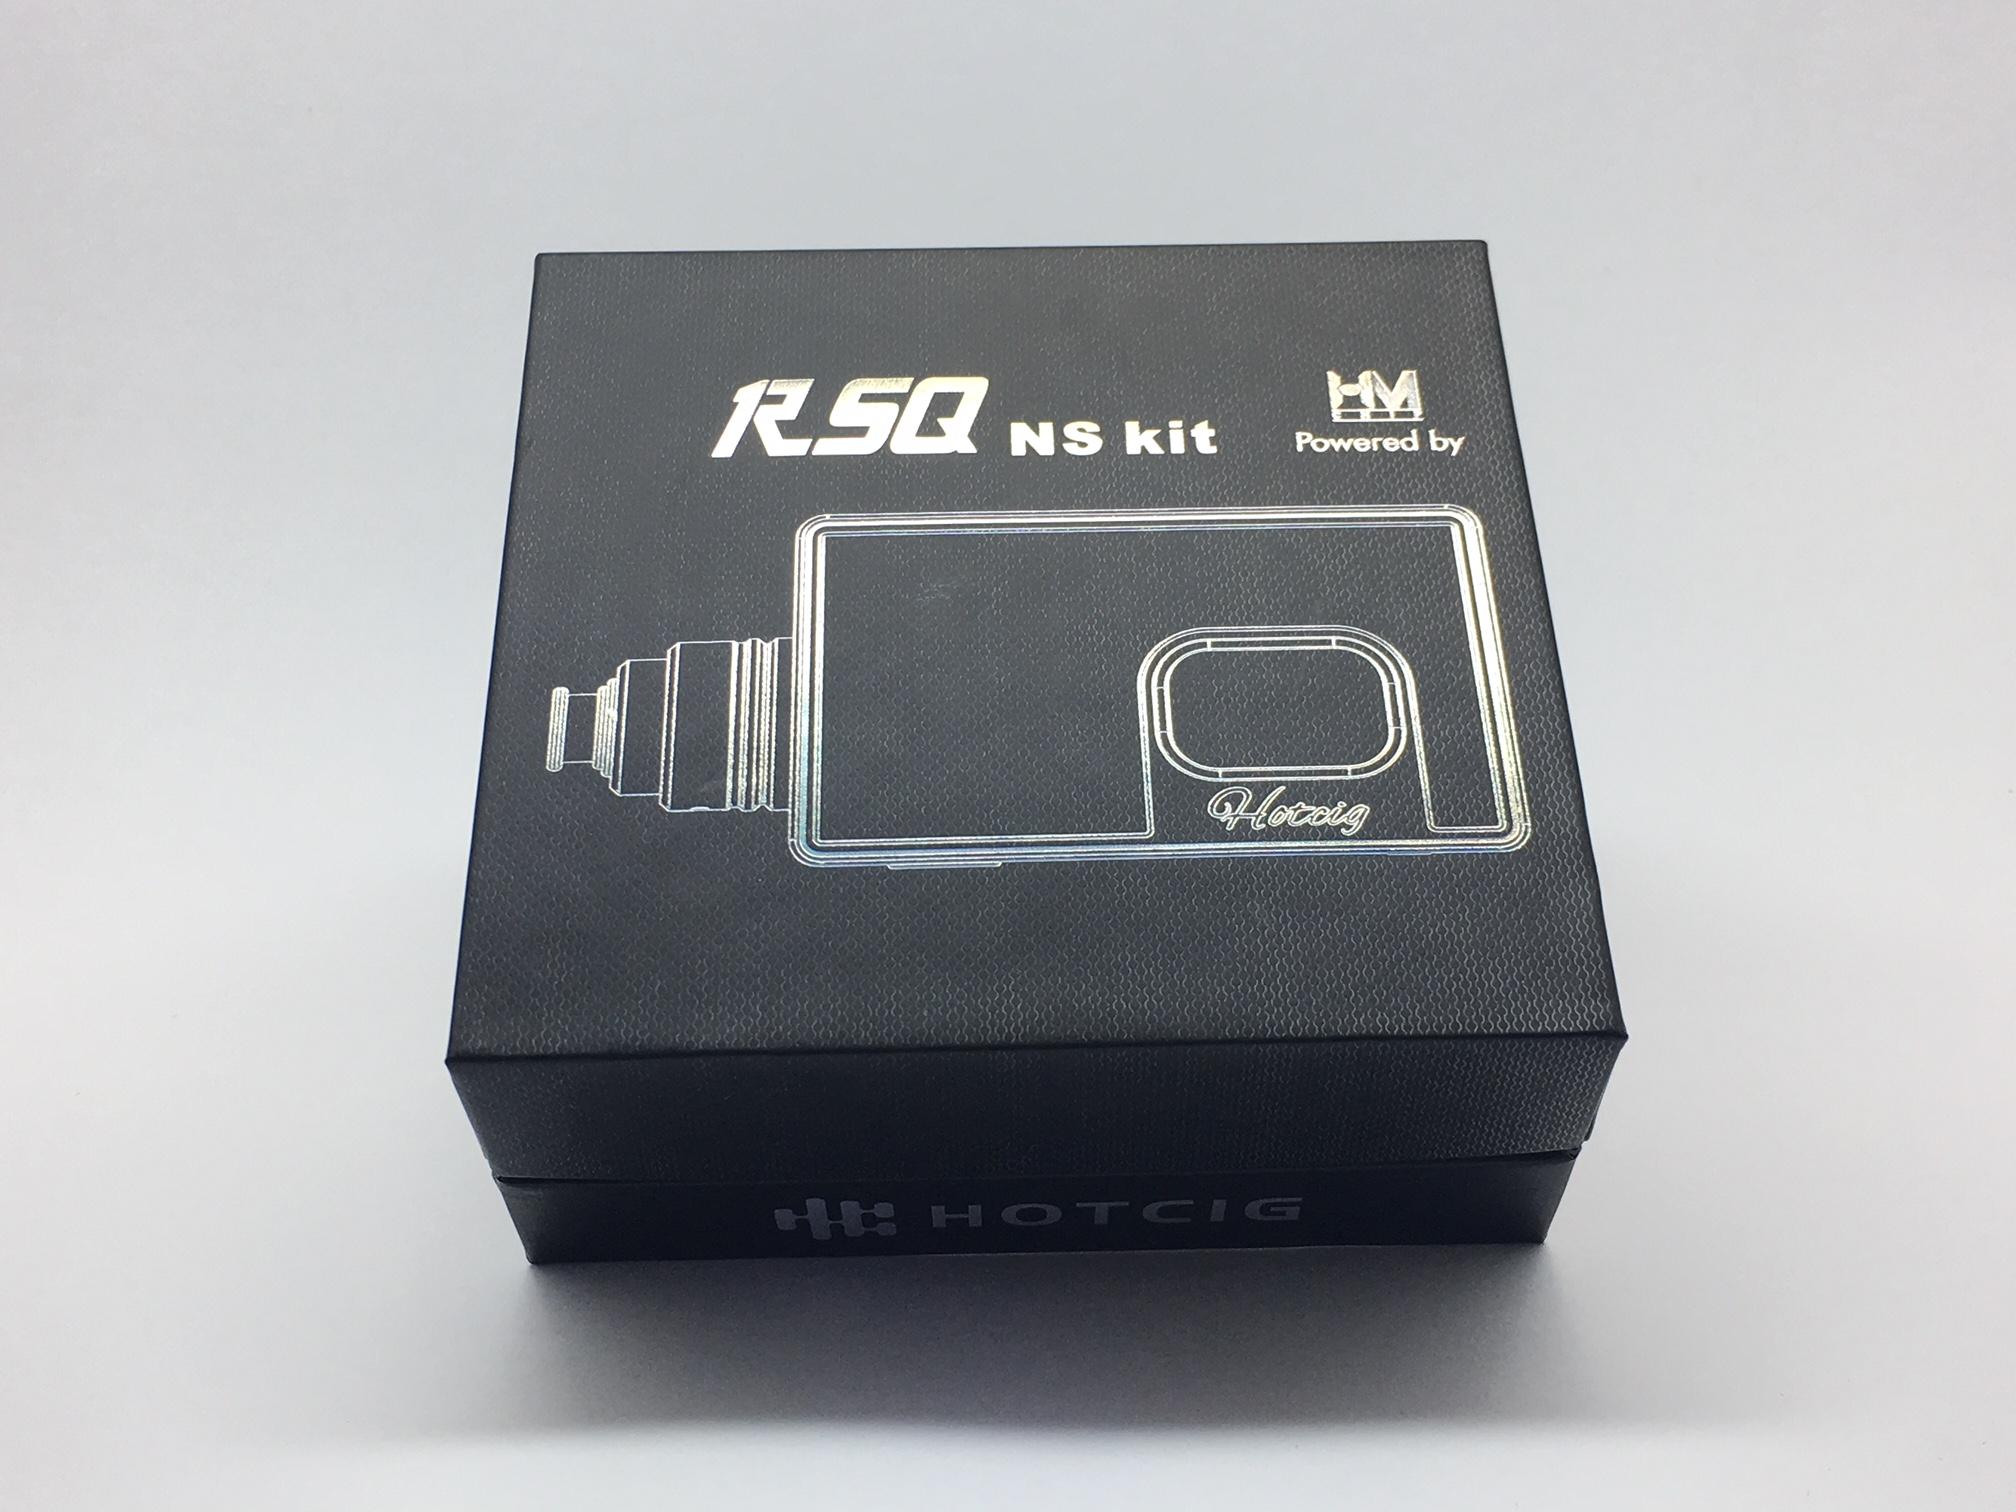 securedownload 34 - 【レビュー】【日本限定版】HOTCIG RSQ NSキット テクニカルスコンカー BF MOD+アトマイザー スターターキット リフィルボトル付き限定版 控えめに言ってヤヴァイやつ。